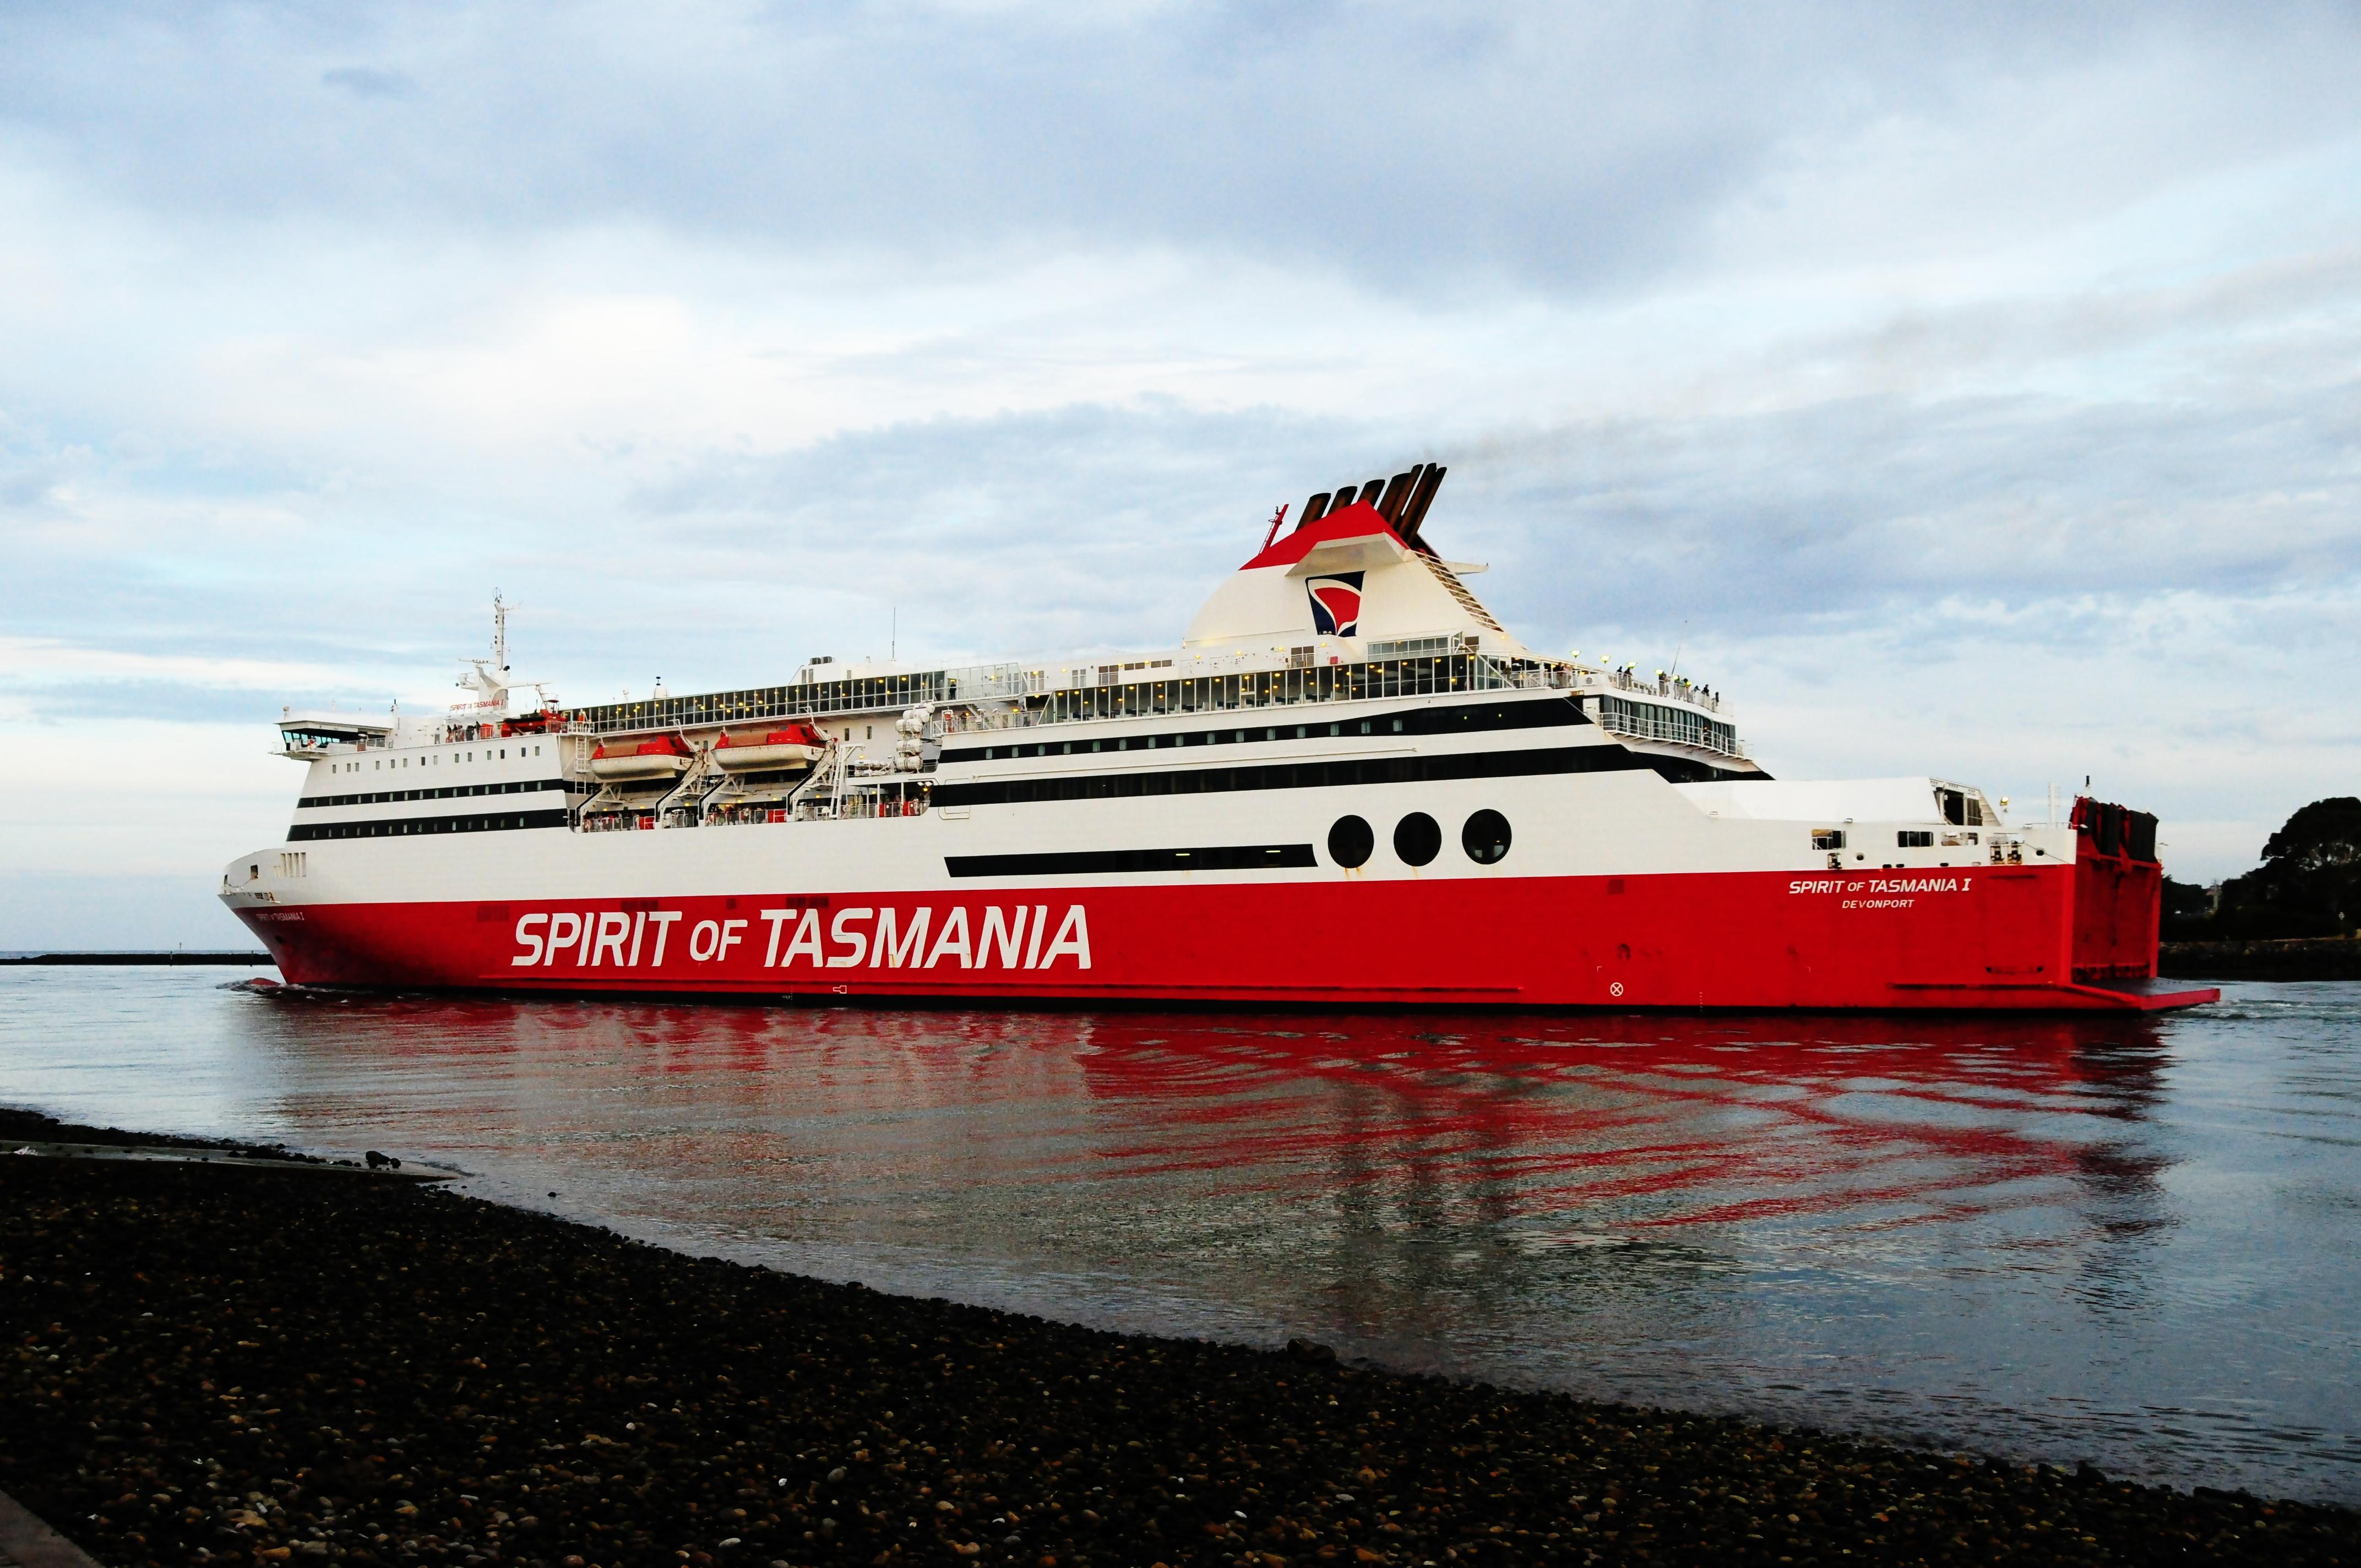 Speed Tasmania Nigeria cukru mumia randki